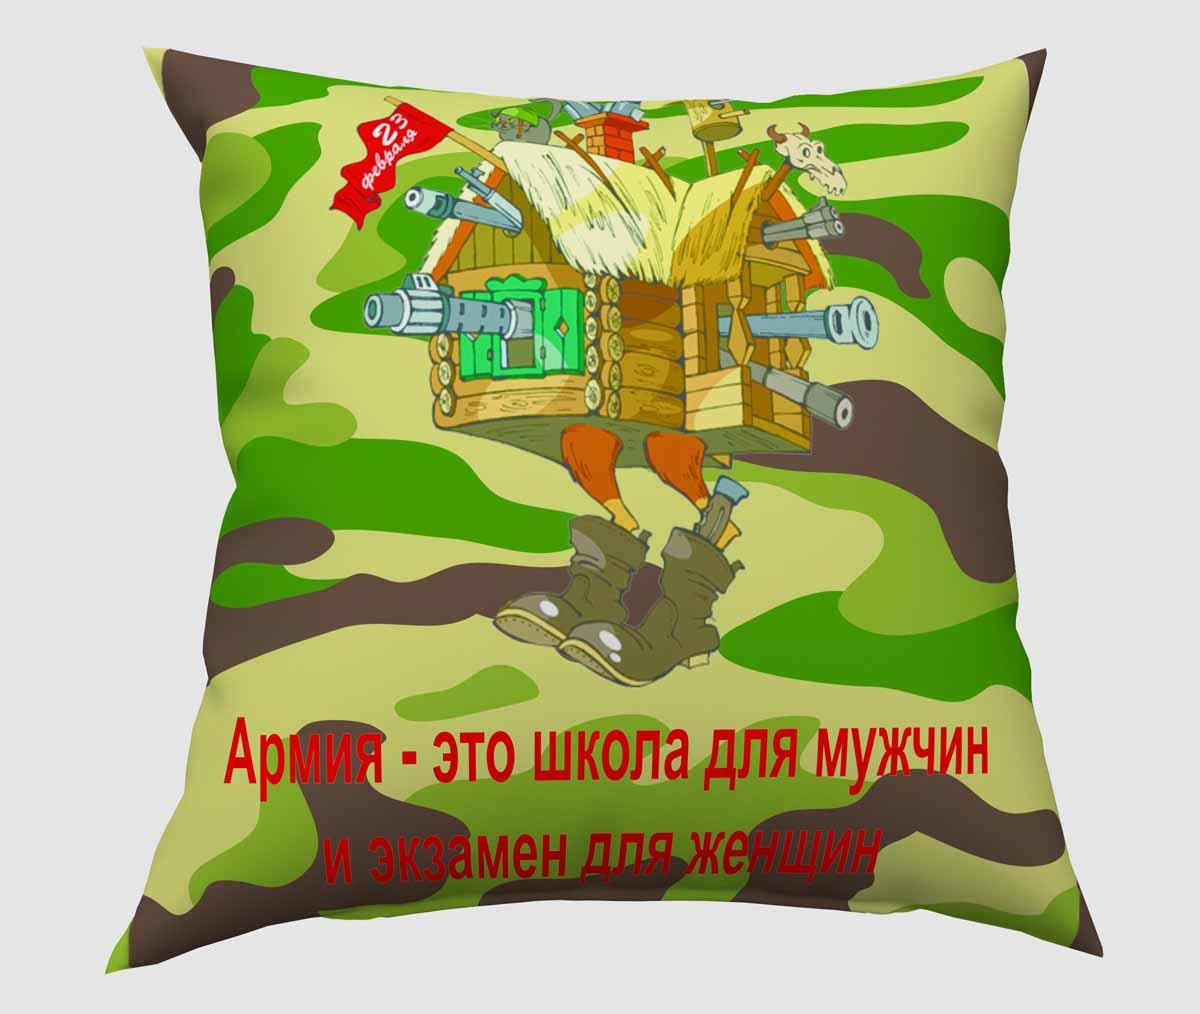 все цены на Подушка декоративная Сирень Армия, 40 х 40 см